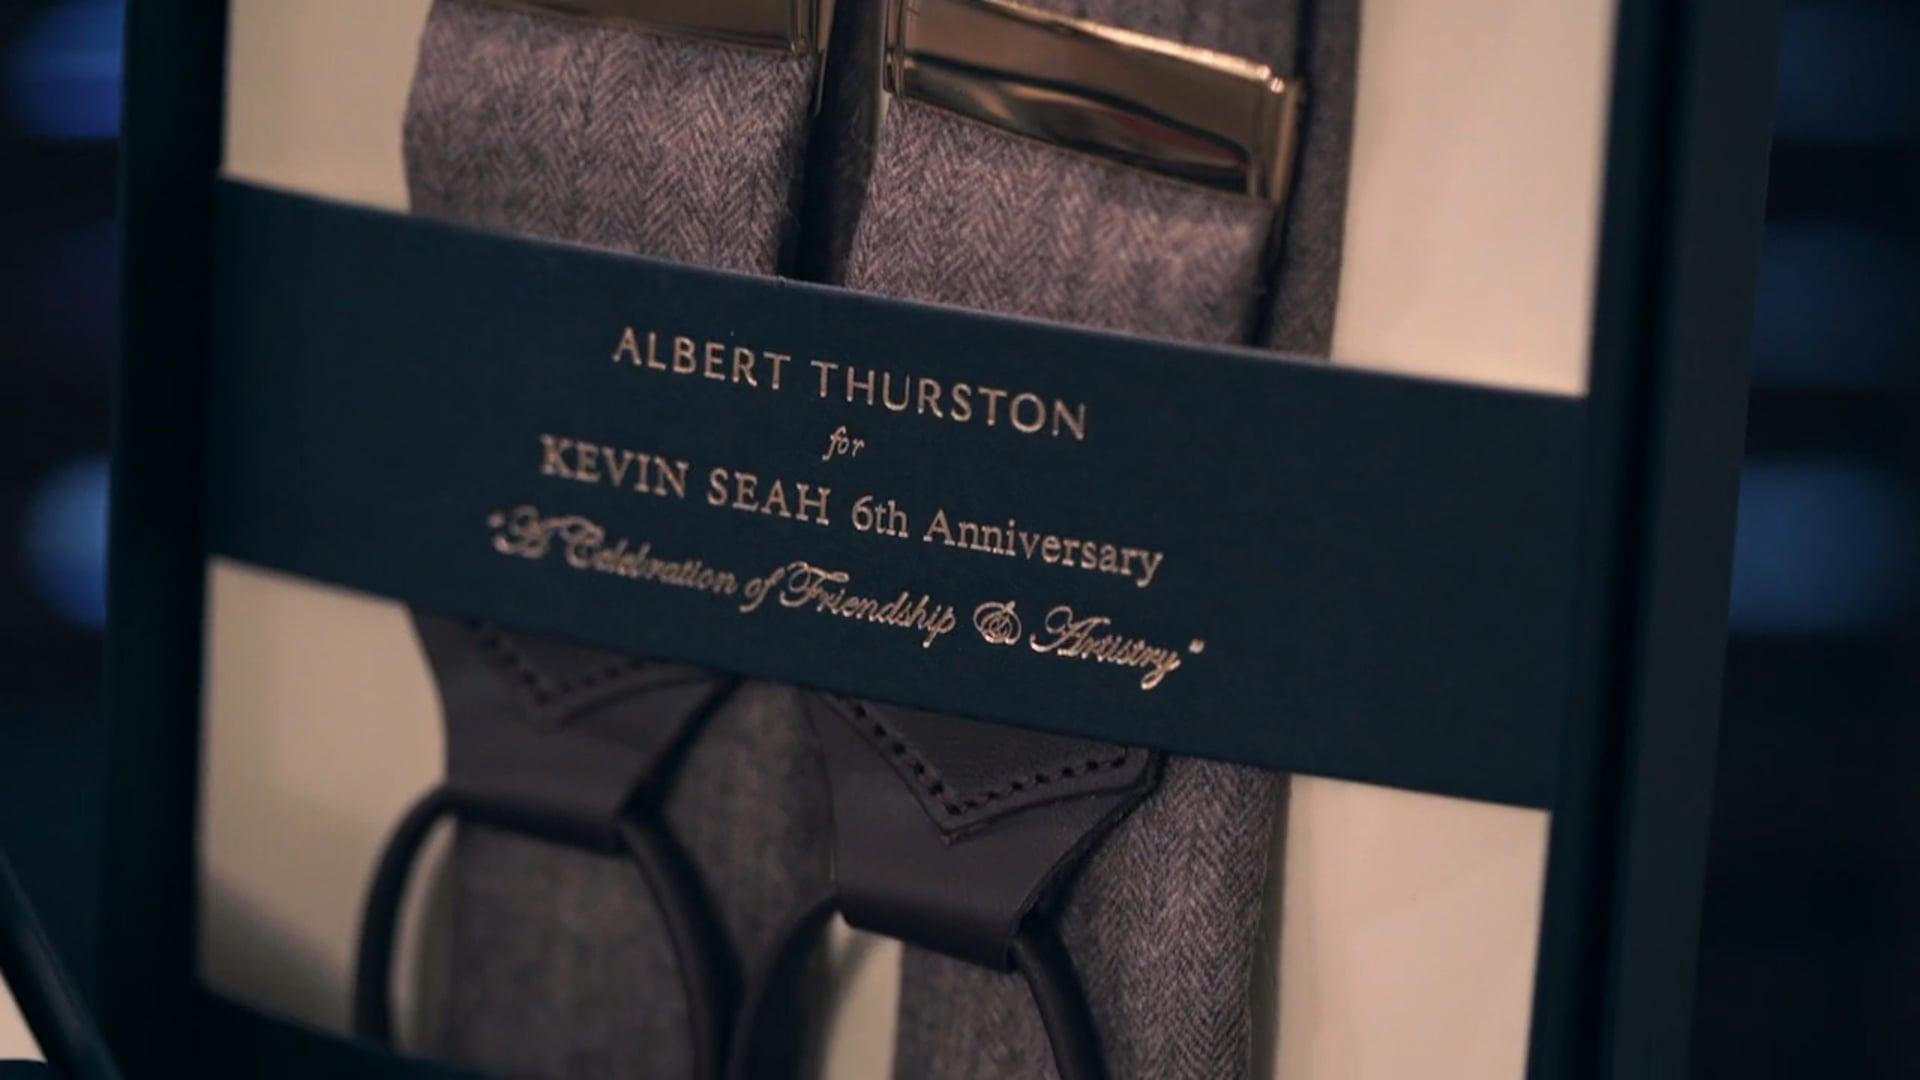 Kevin Seah Bespoke 6th Anniversary